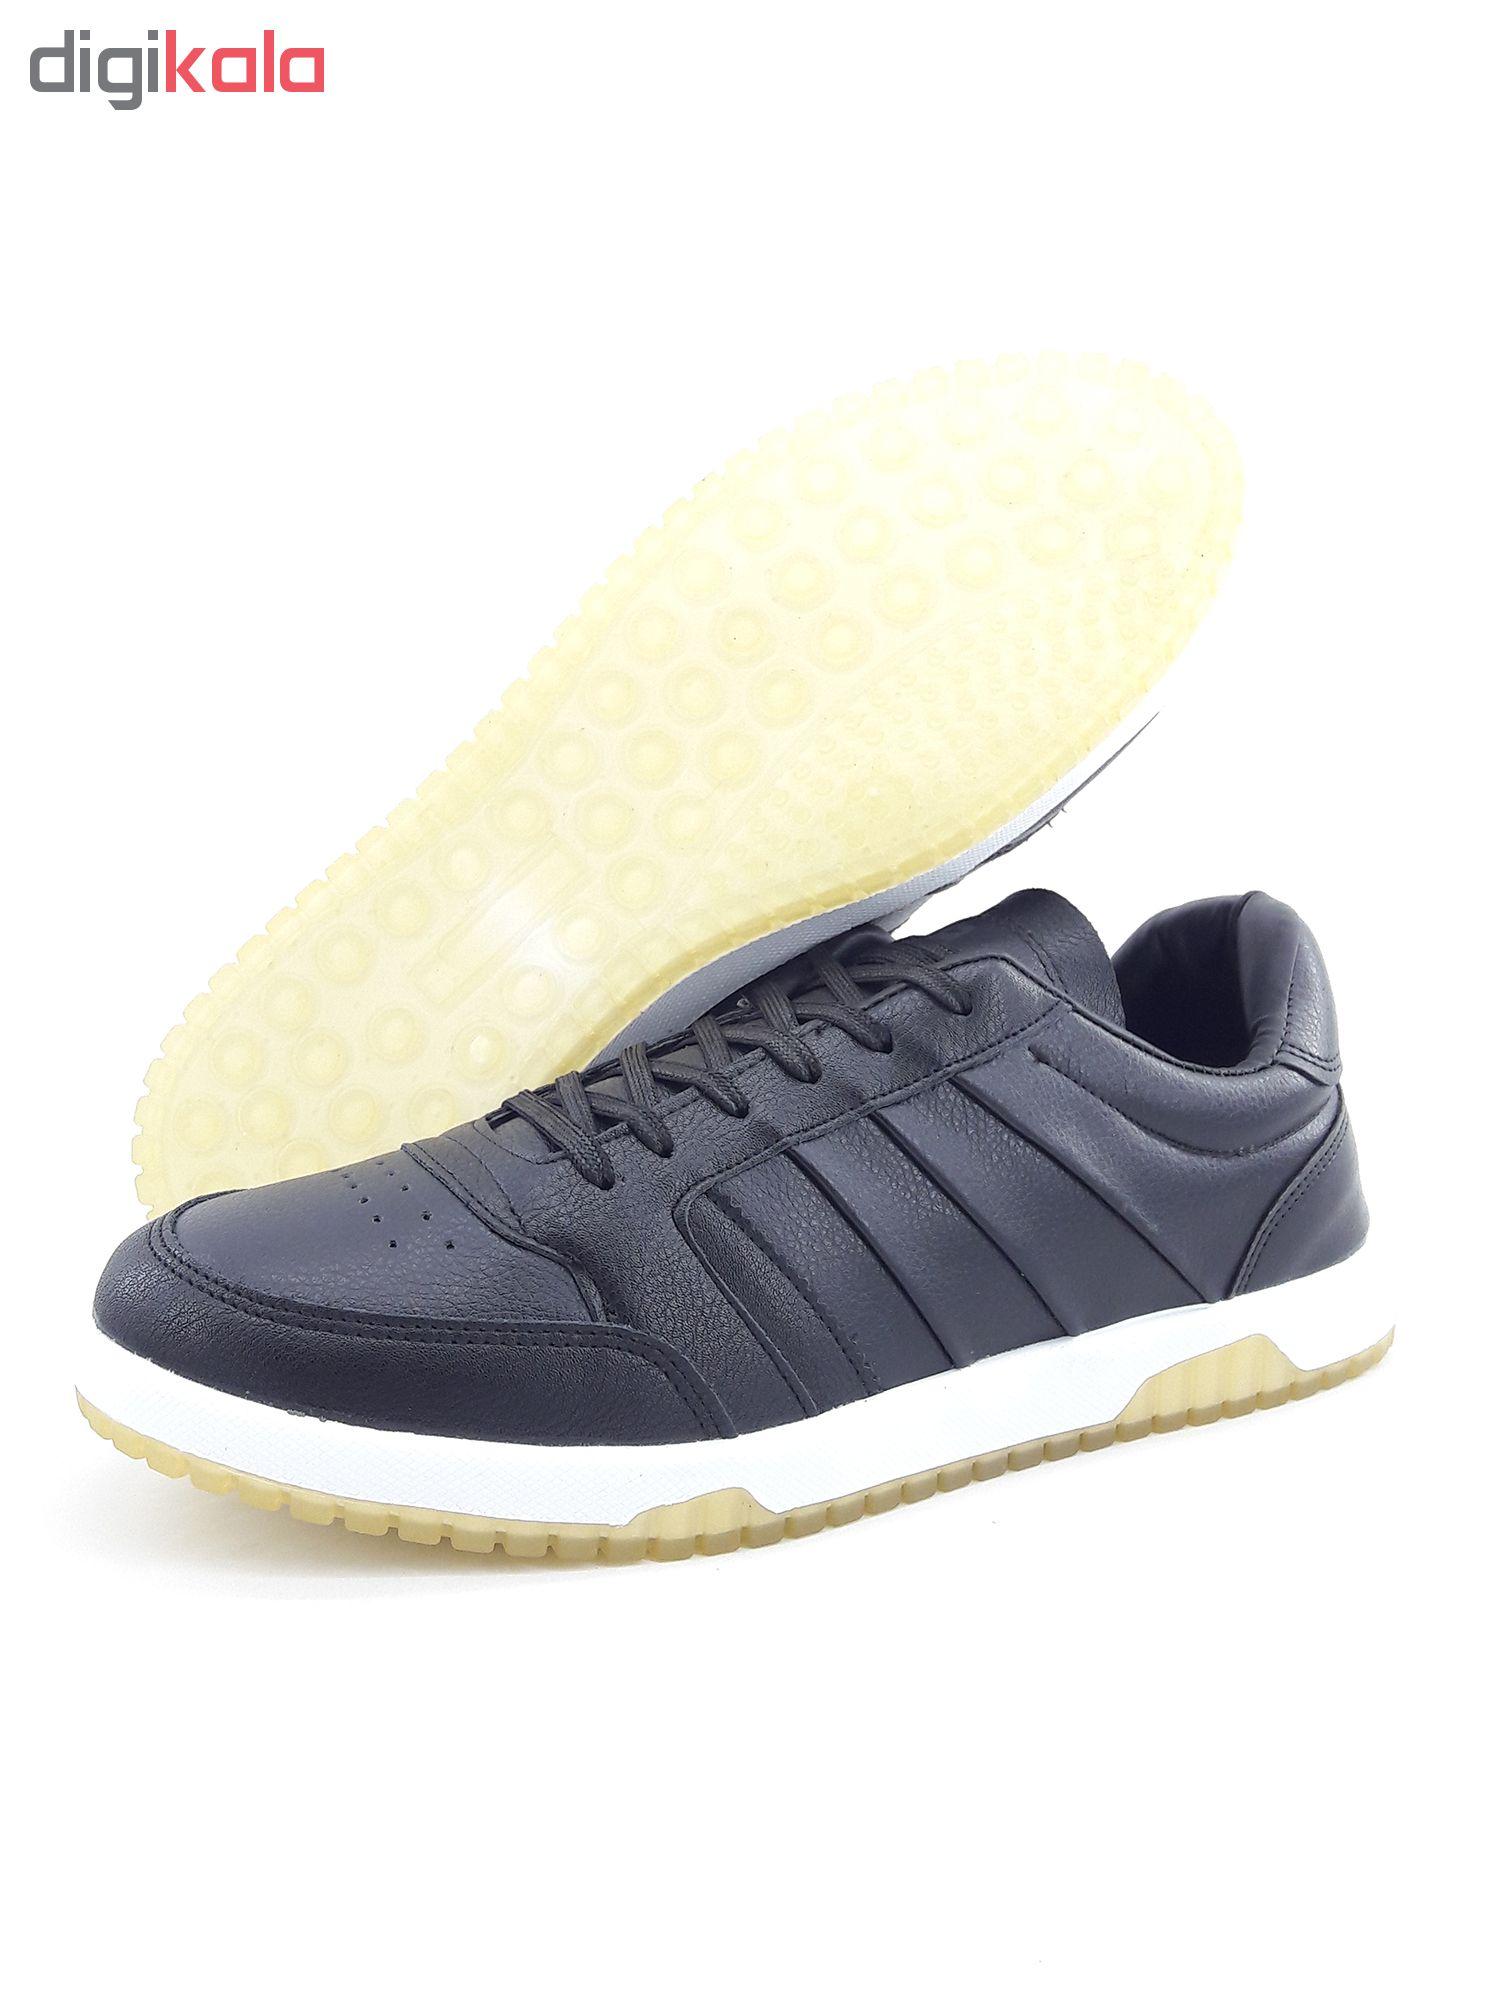 کفش راحتی مردانه مدل D bl-001